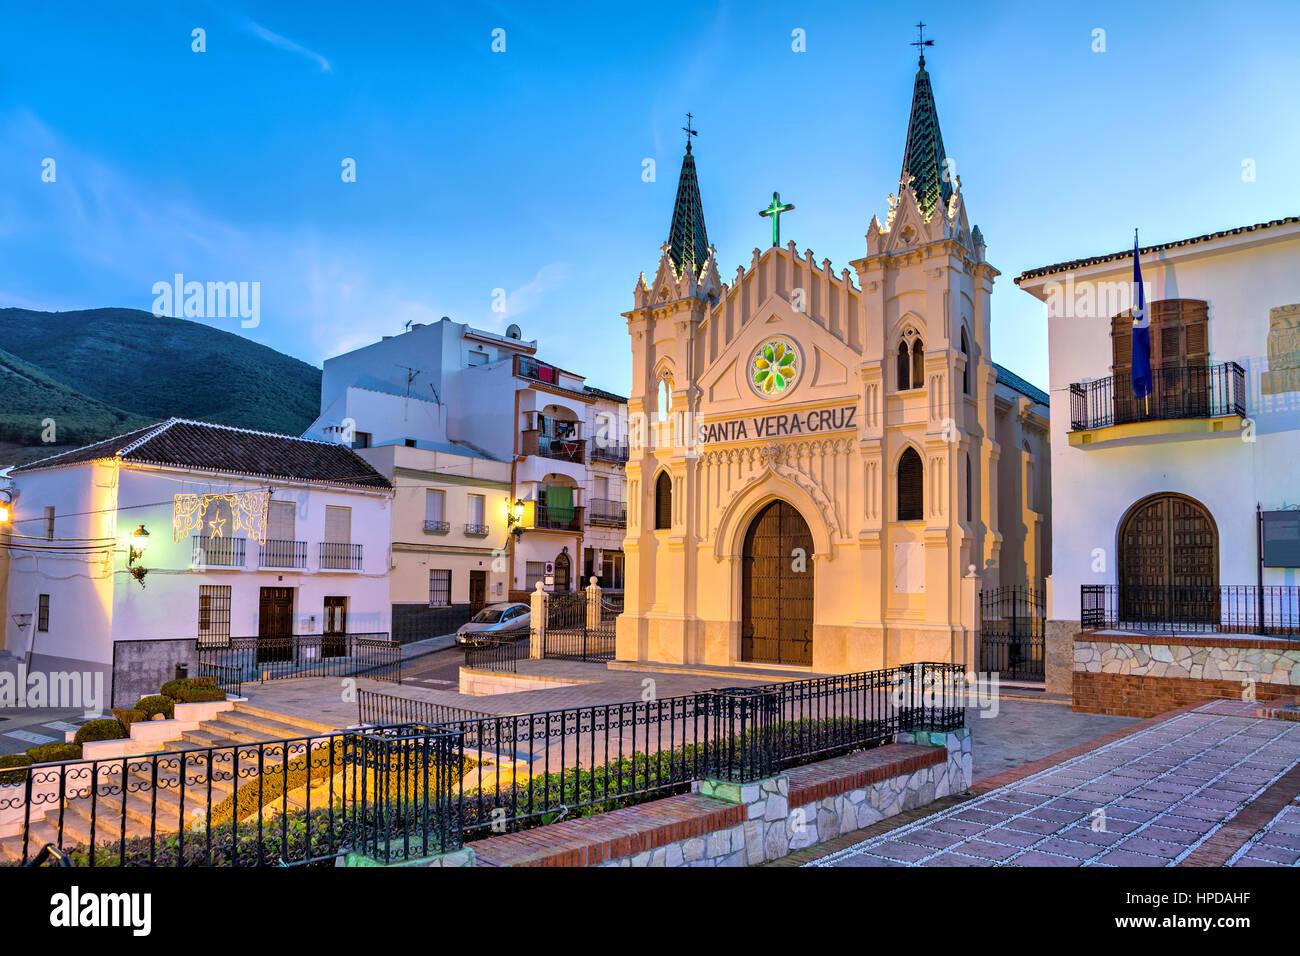 Church of Santa Vera Cruz in the evening in Alhaurin el Grande, Malaga province, Andalusia, Spain - Stock Image